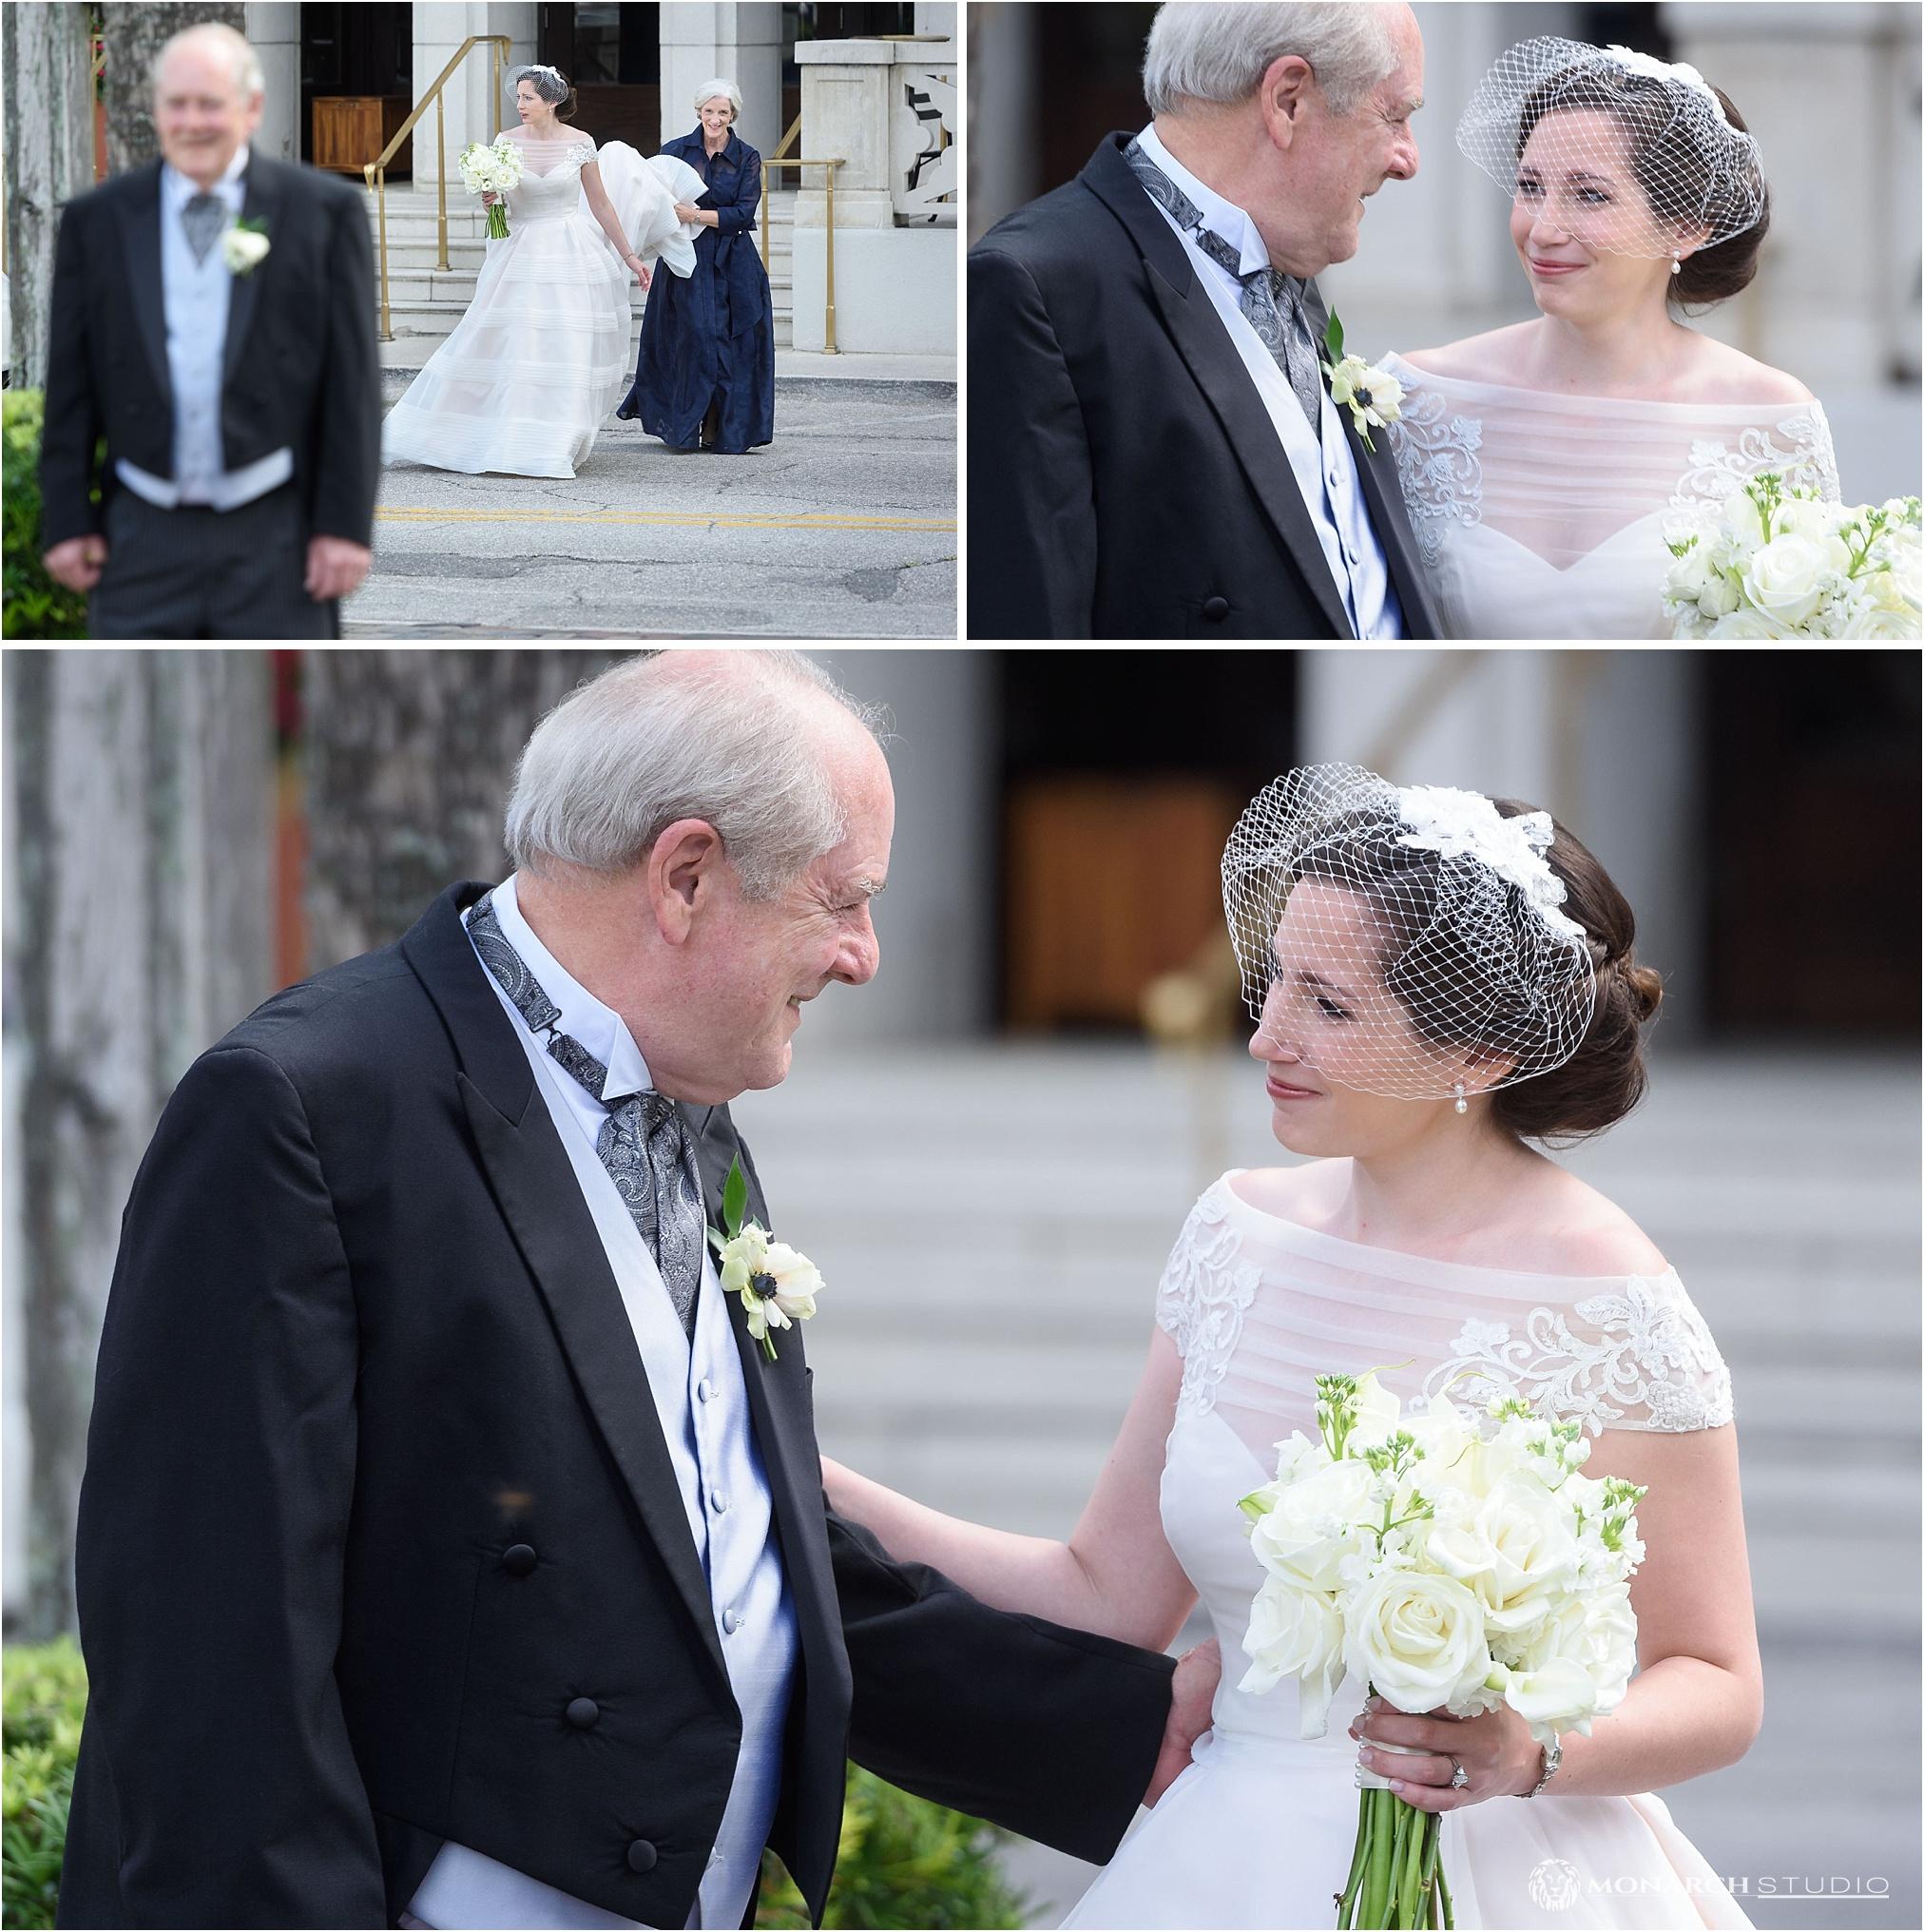 015-st-augustine-wedding-photographer-.jpg